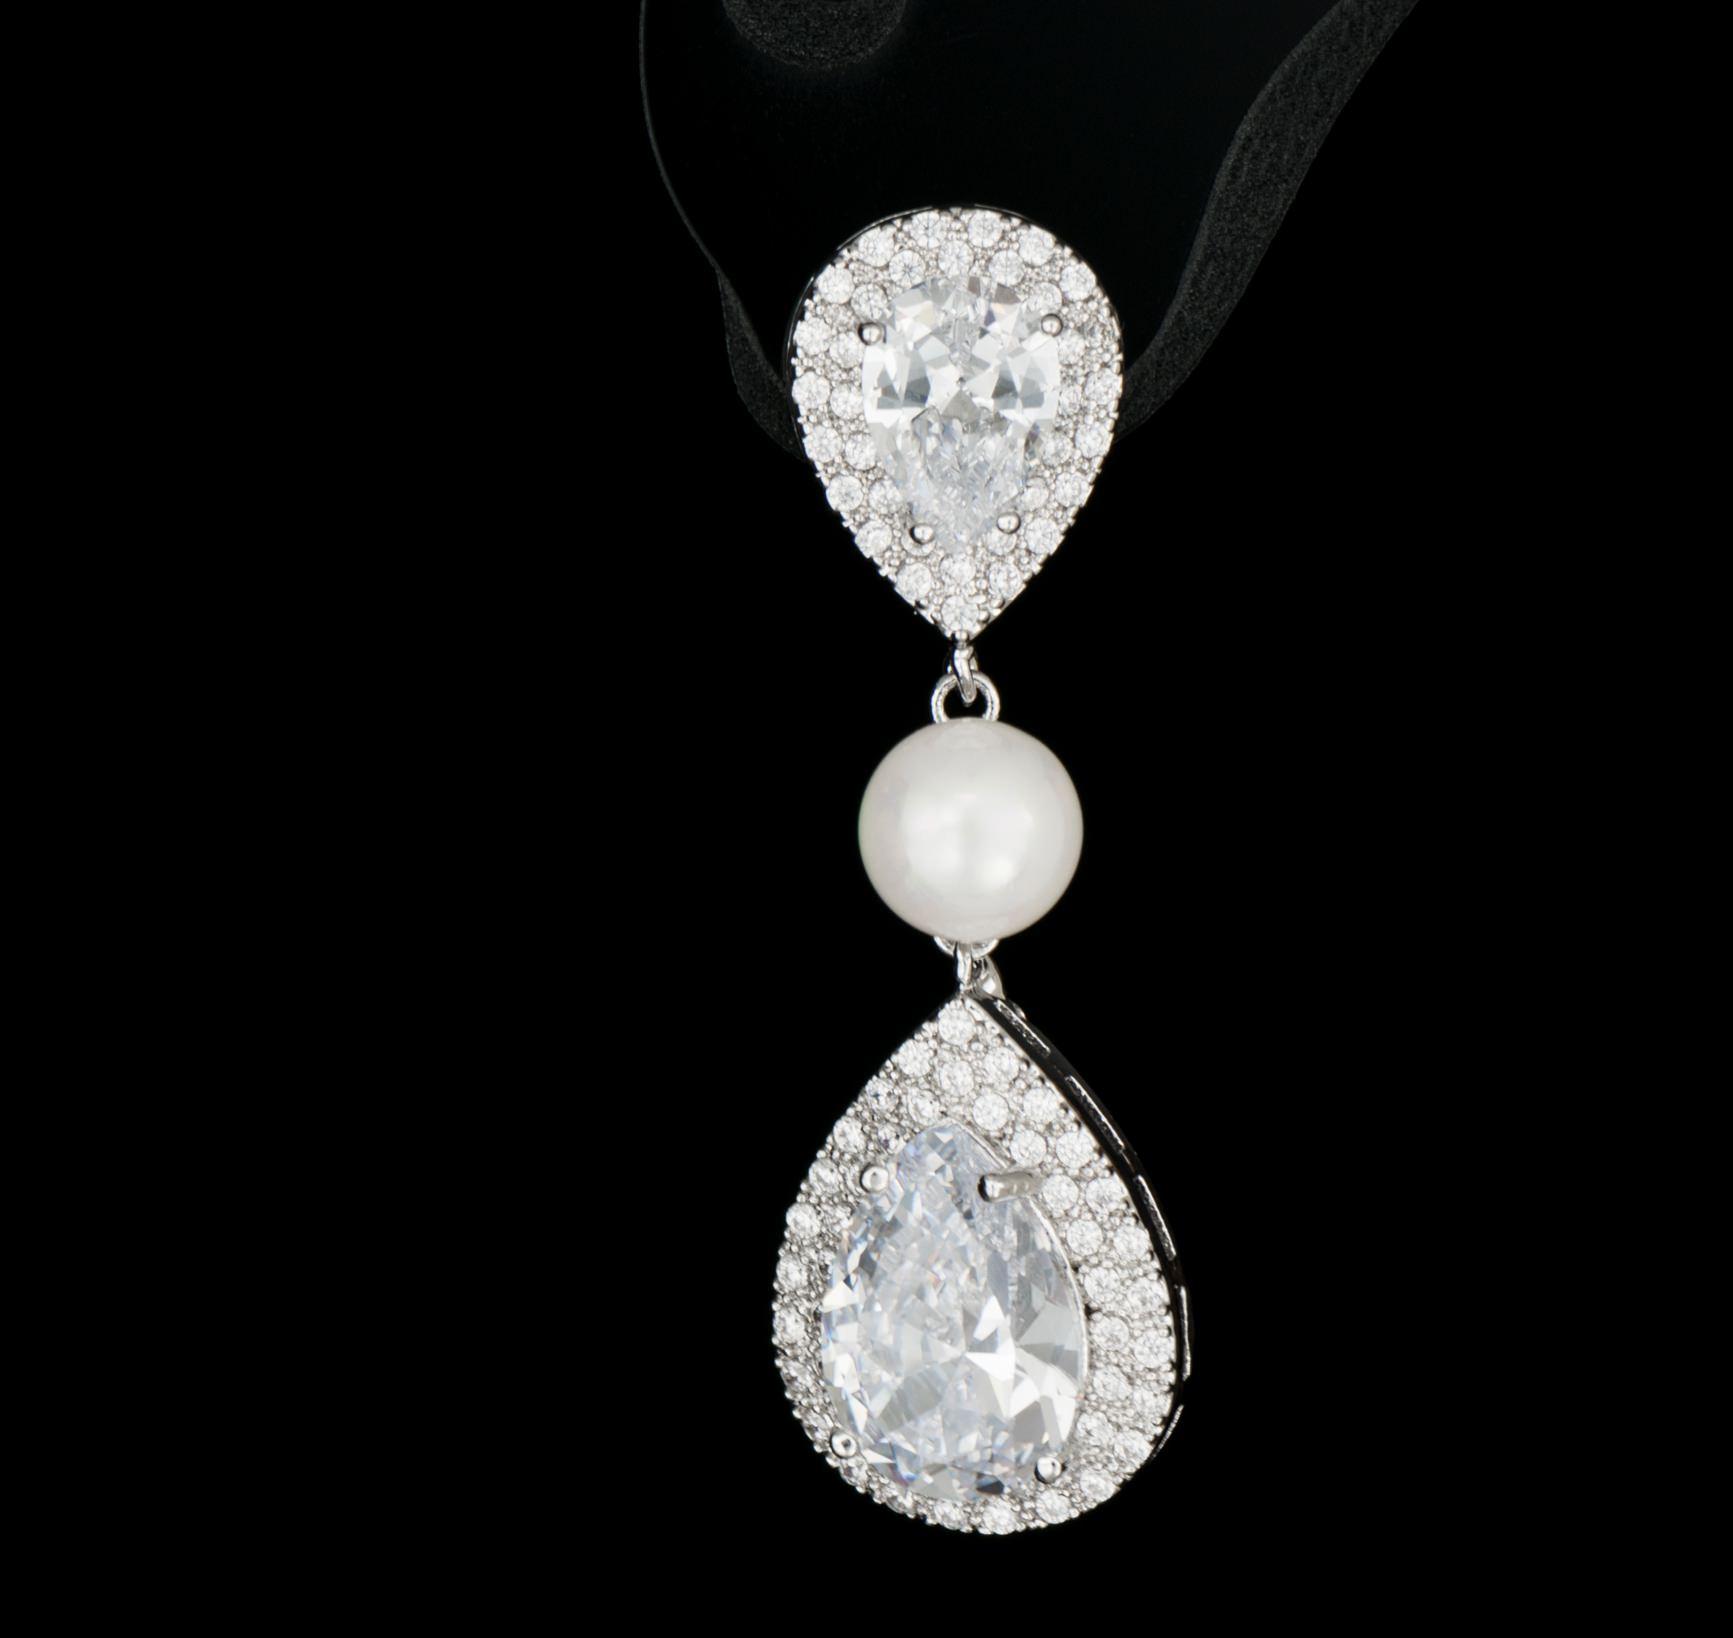 fotografie 360 grade cercei diamante - tangled-design.ro